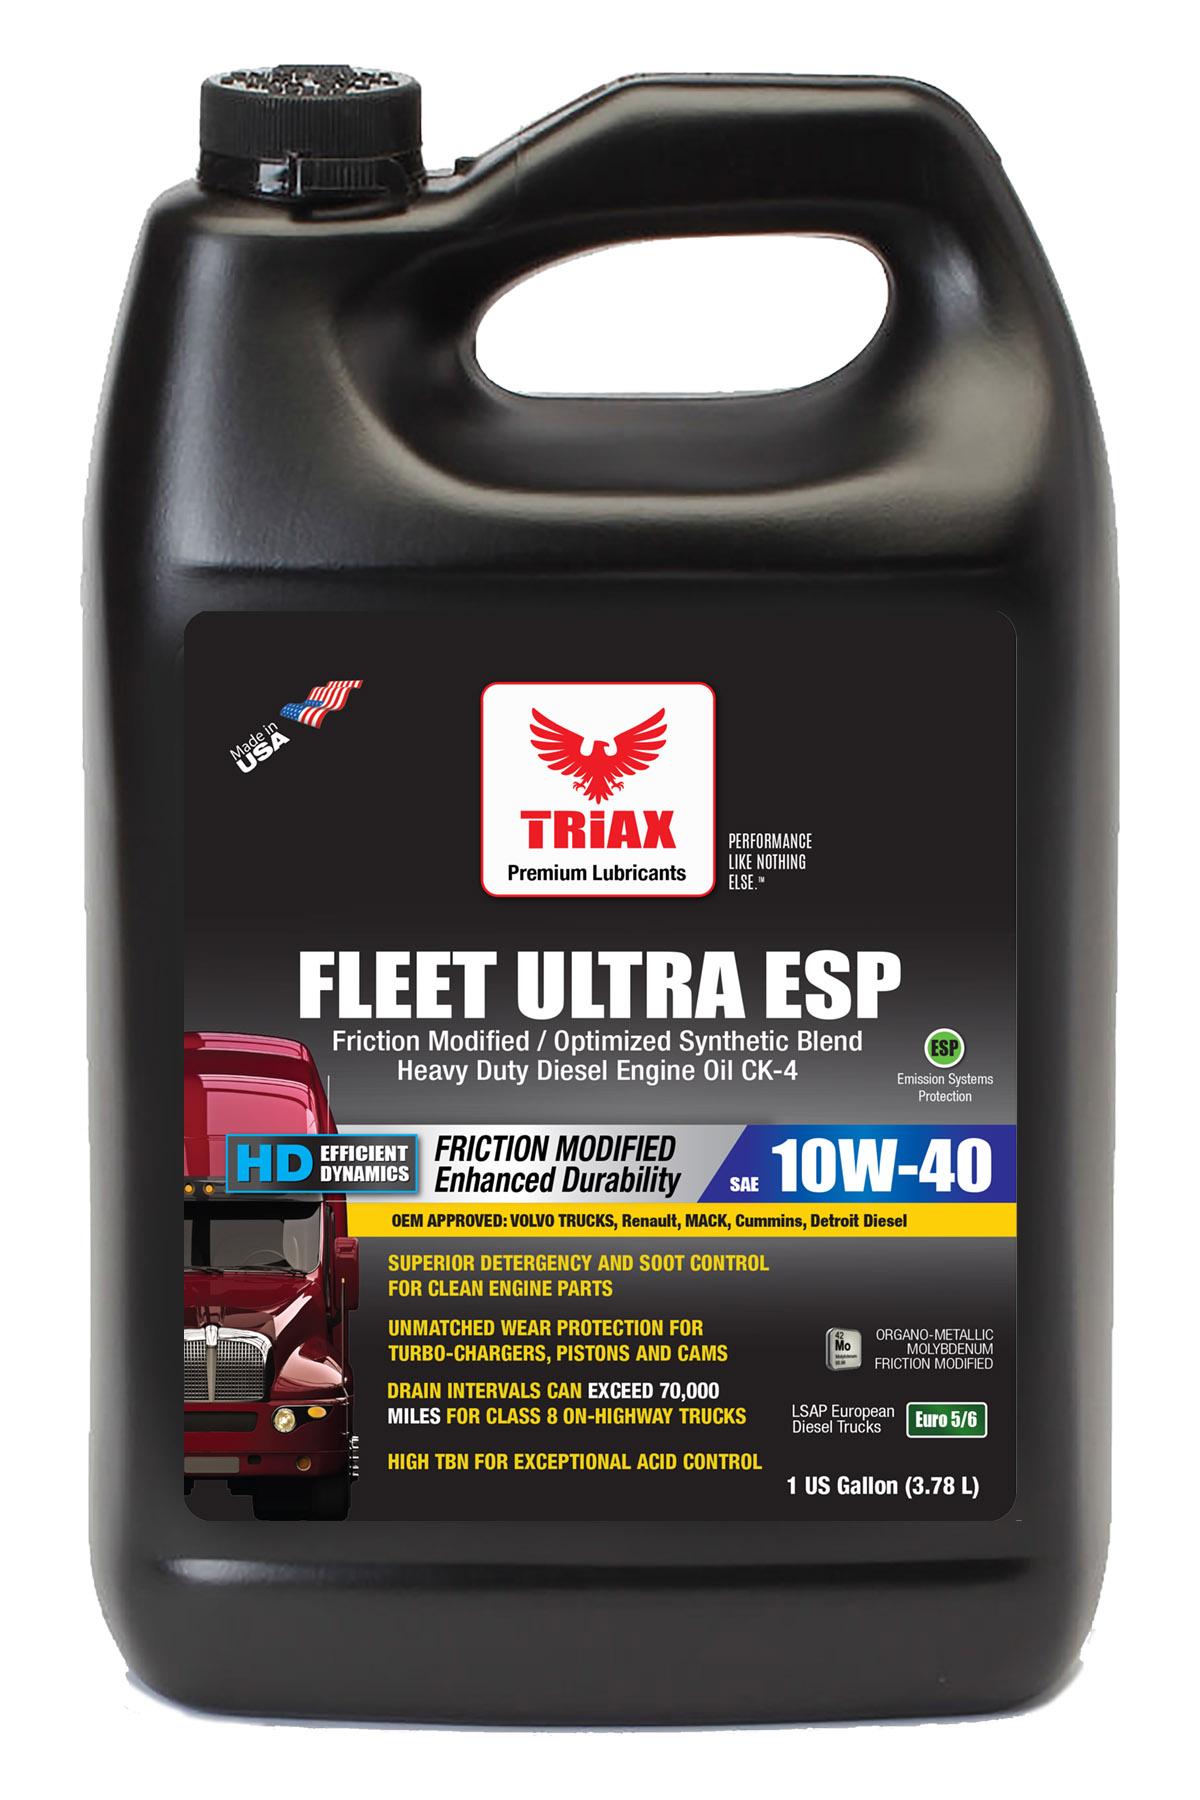 TRIAX Fleet Ultra ESP Synthetic 10W-40 CK-4 Euro V